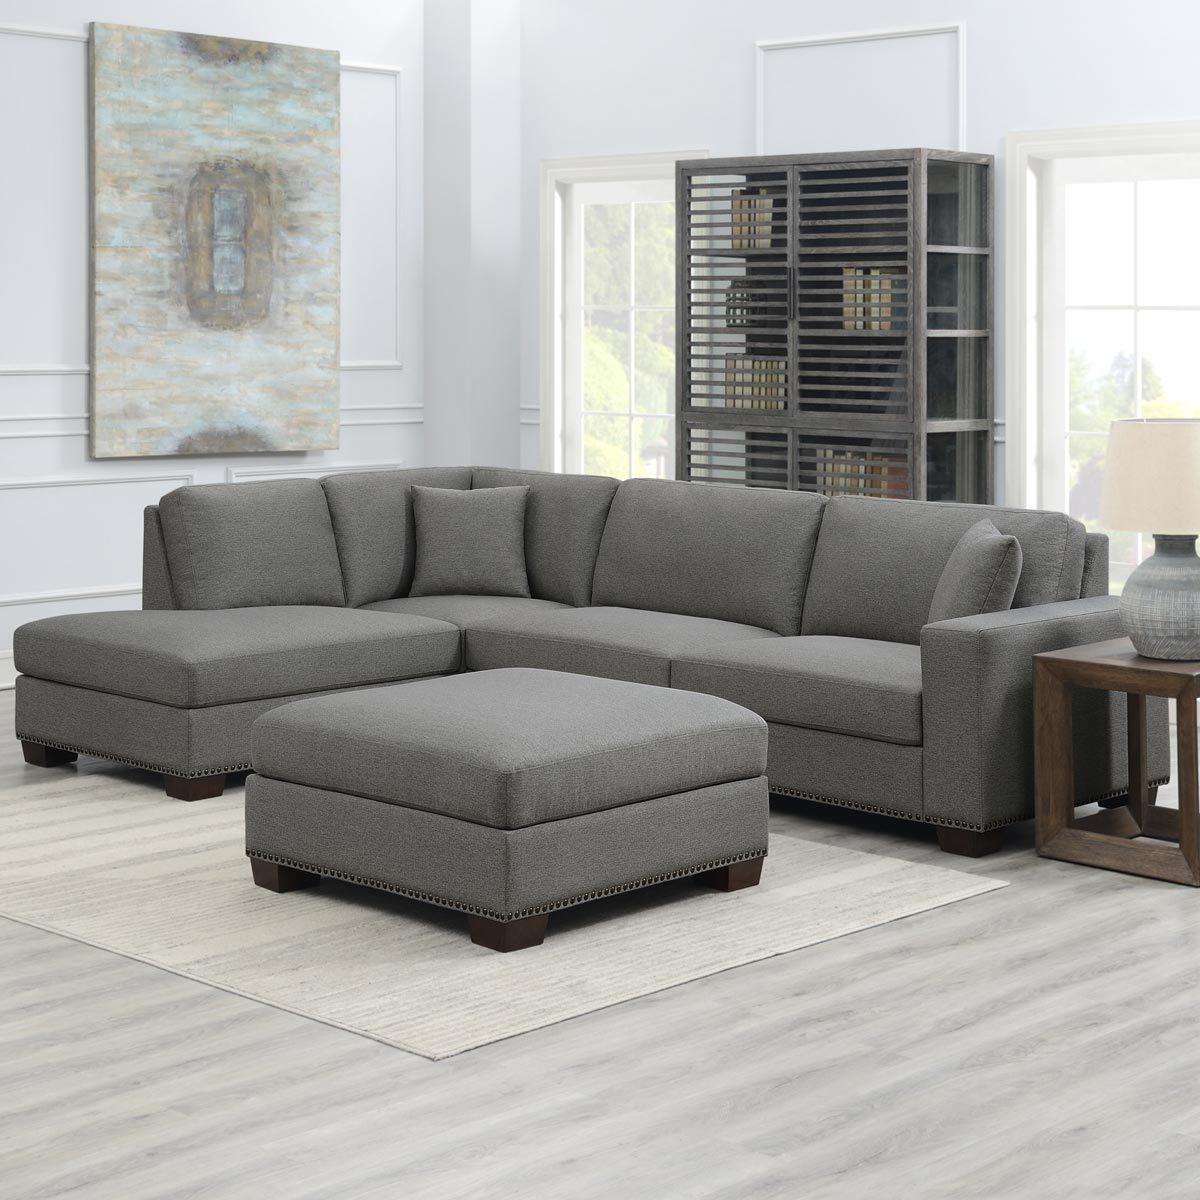 Thomasville Artesia Grey Fabric Sectional Sofa With Ottoman Costco Uk In 2020 Fabric Sectional Sofas Sectional Sofa Fabric Sectional